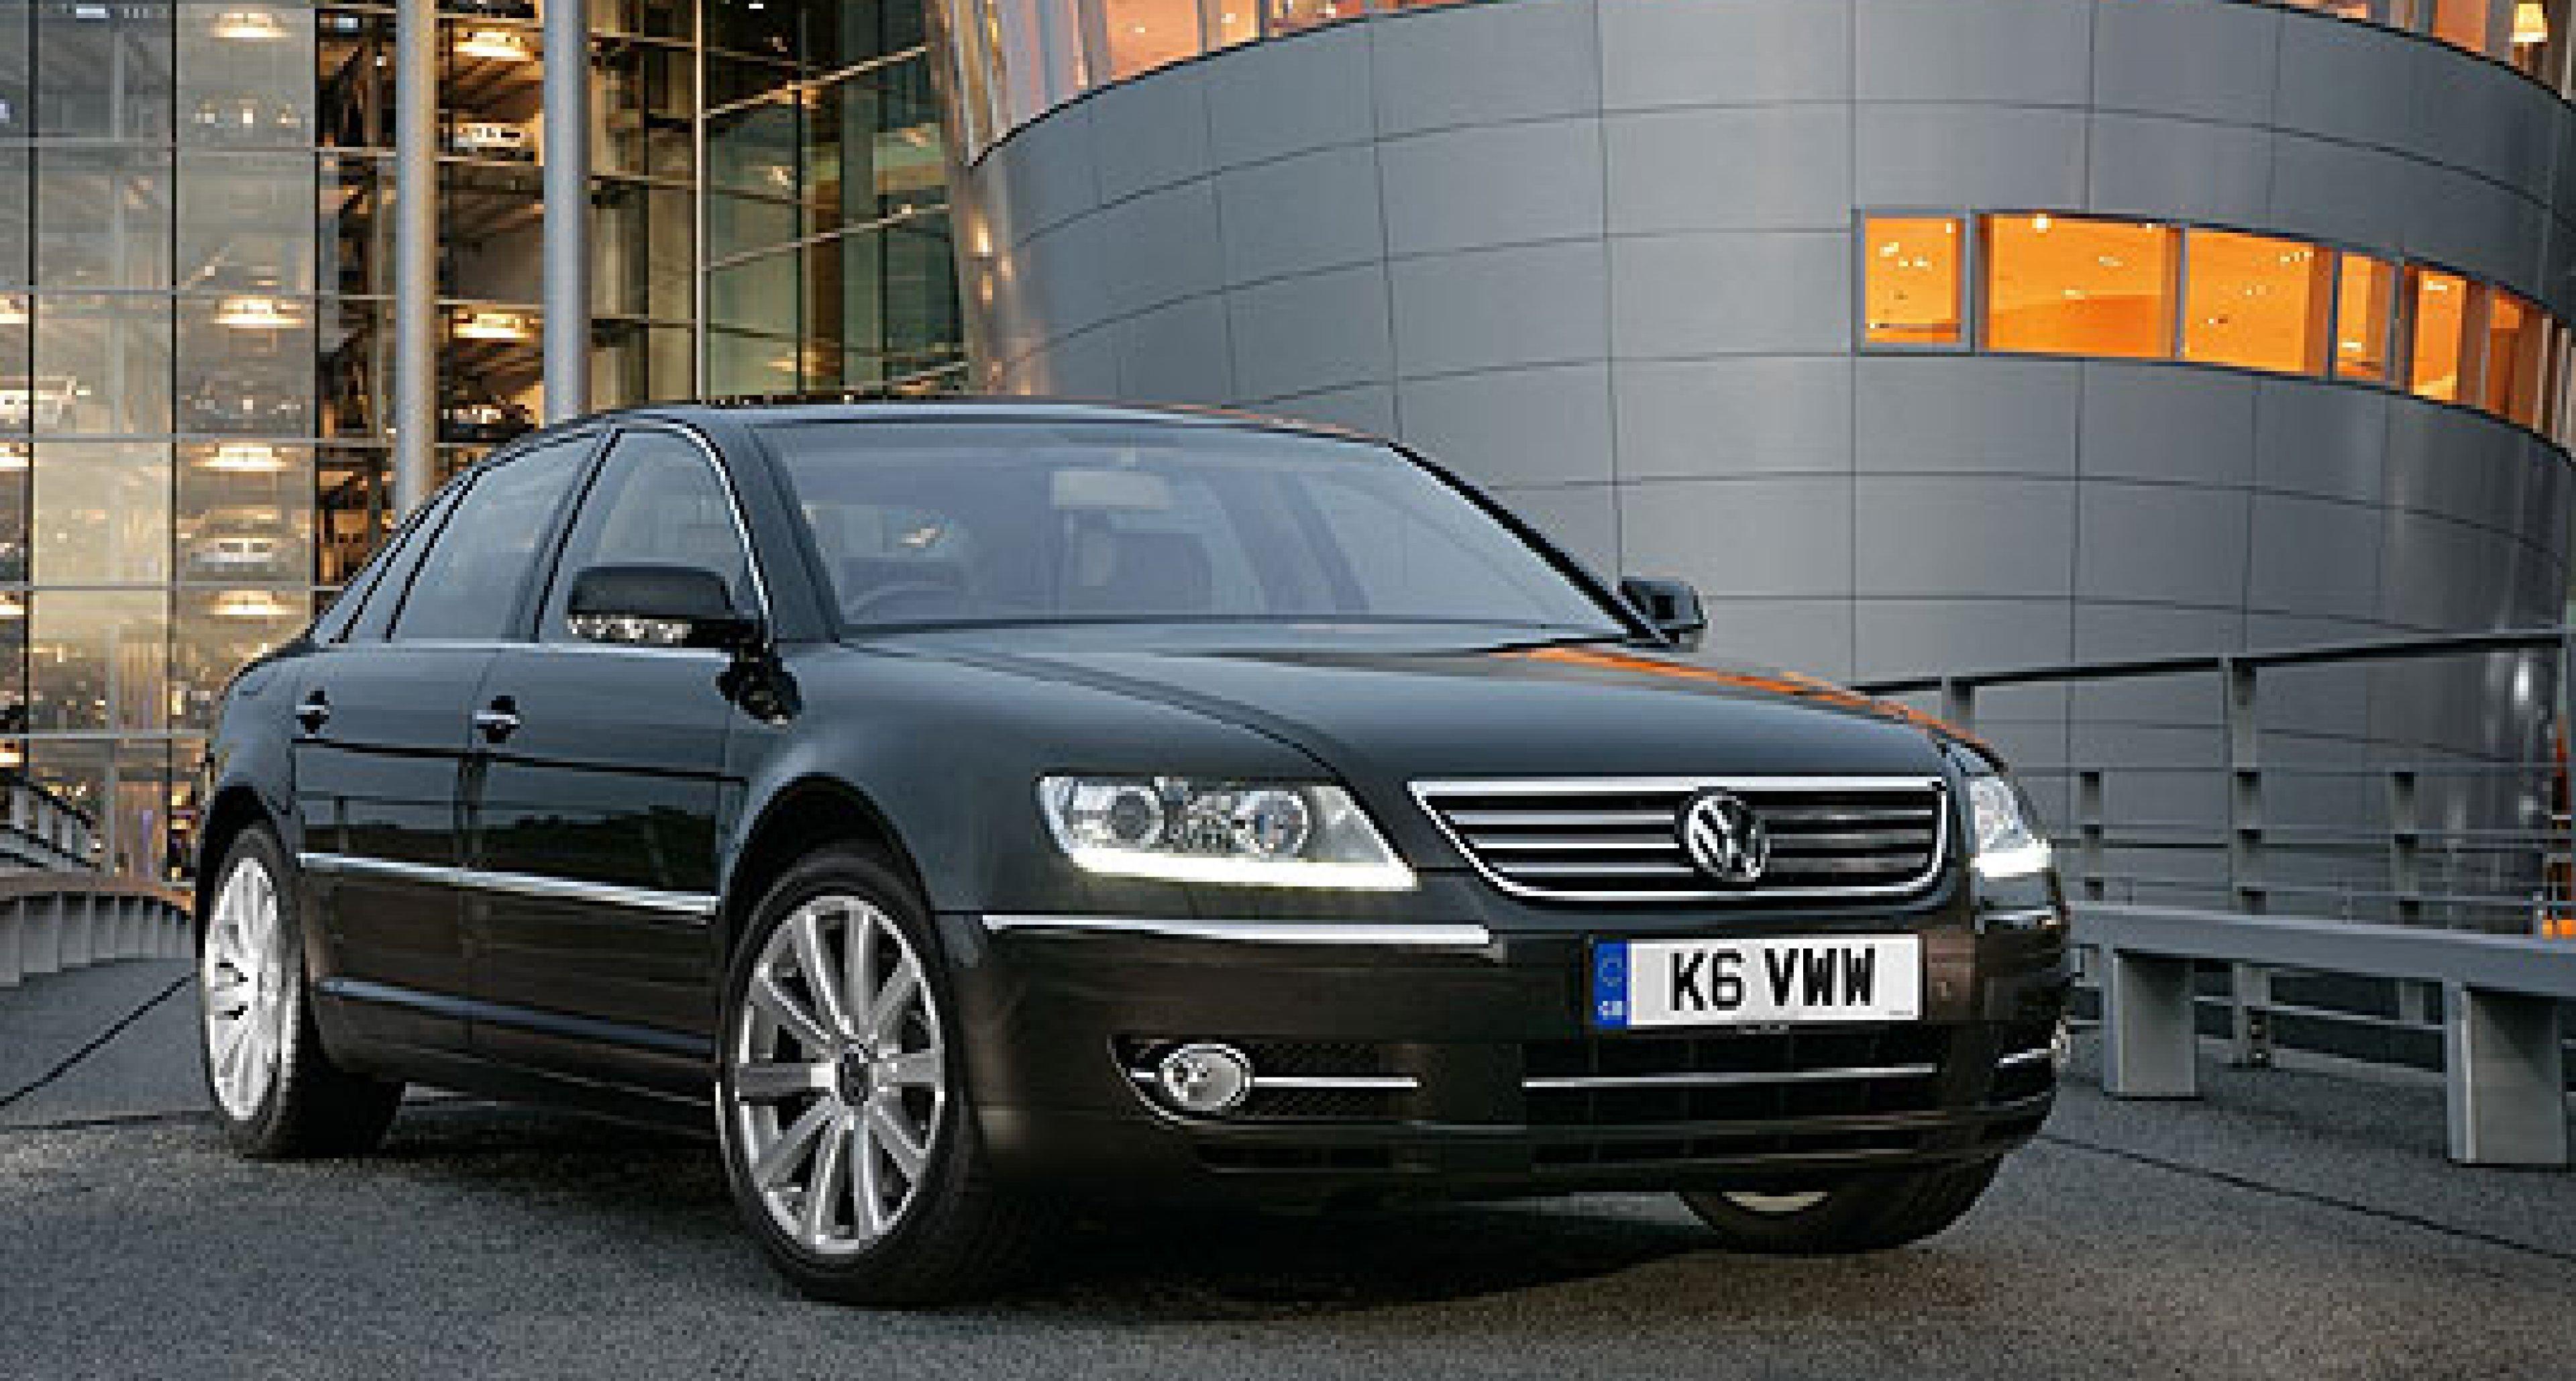 Volkswagen Phaeton: cost-conscious luxury?